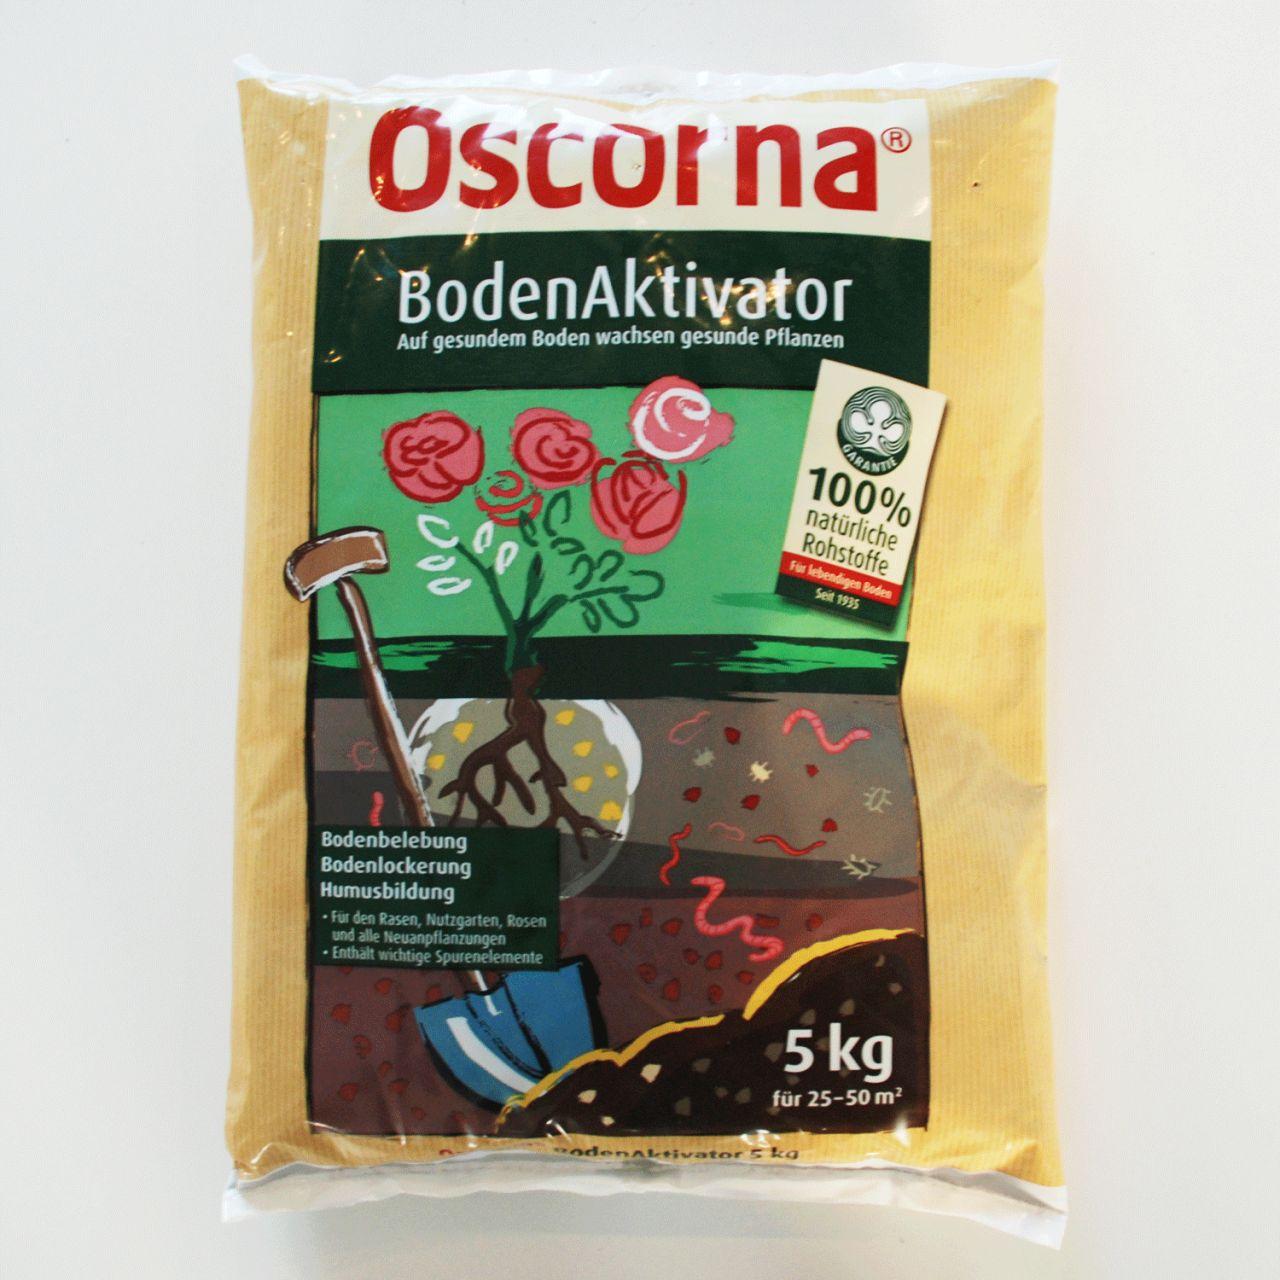 OSCORNA Bodenaktivator - 5 kg